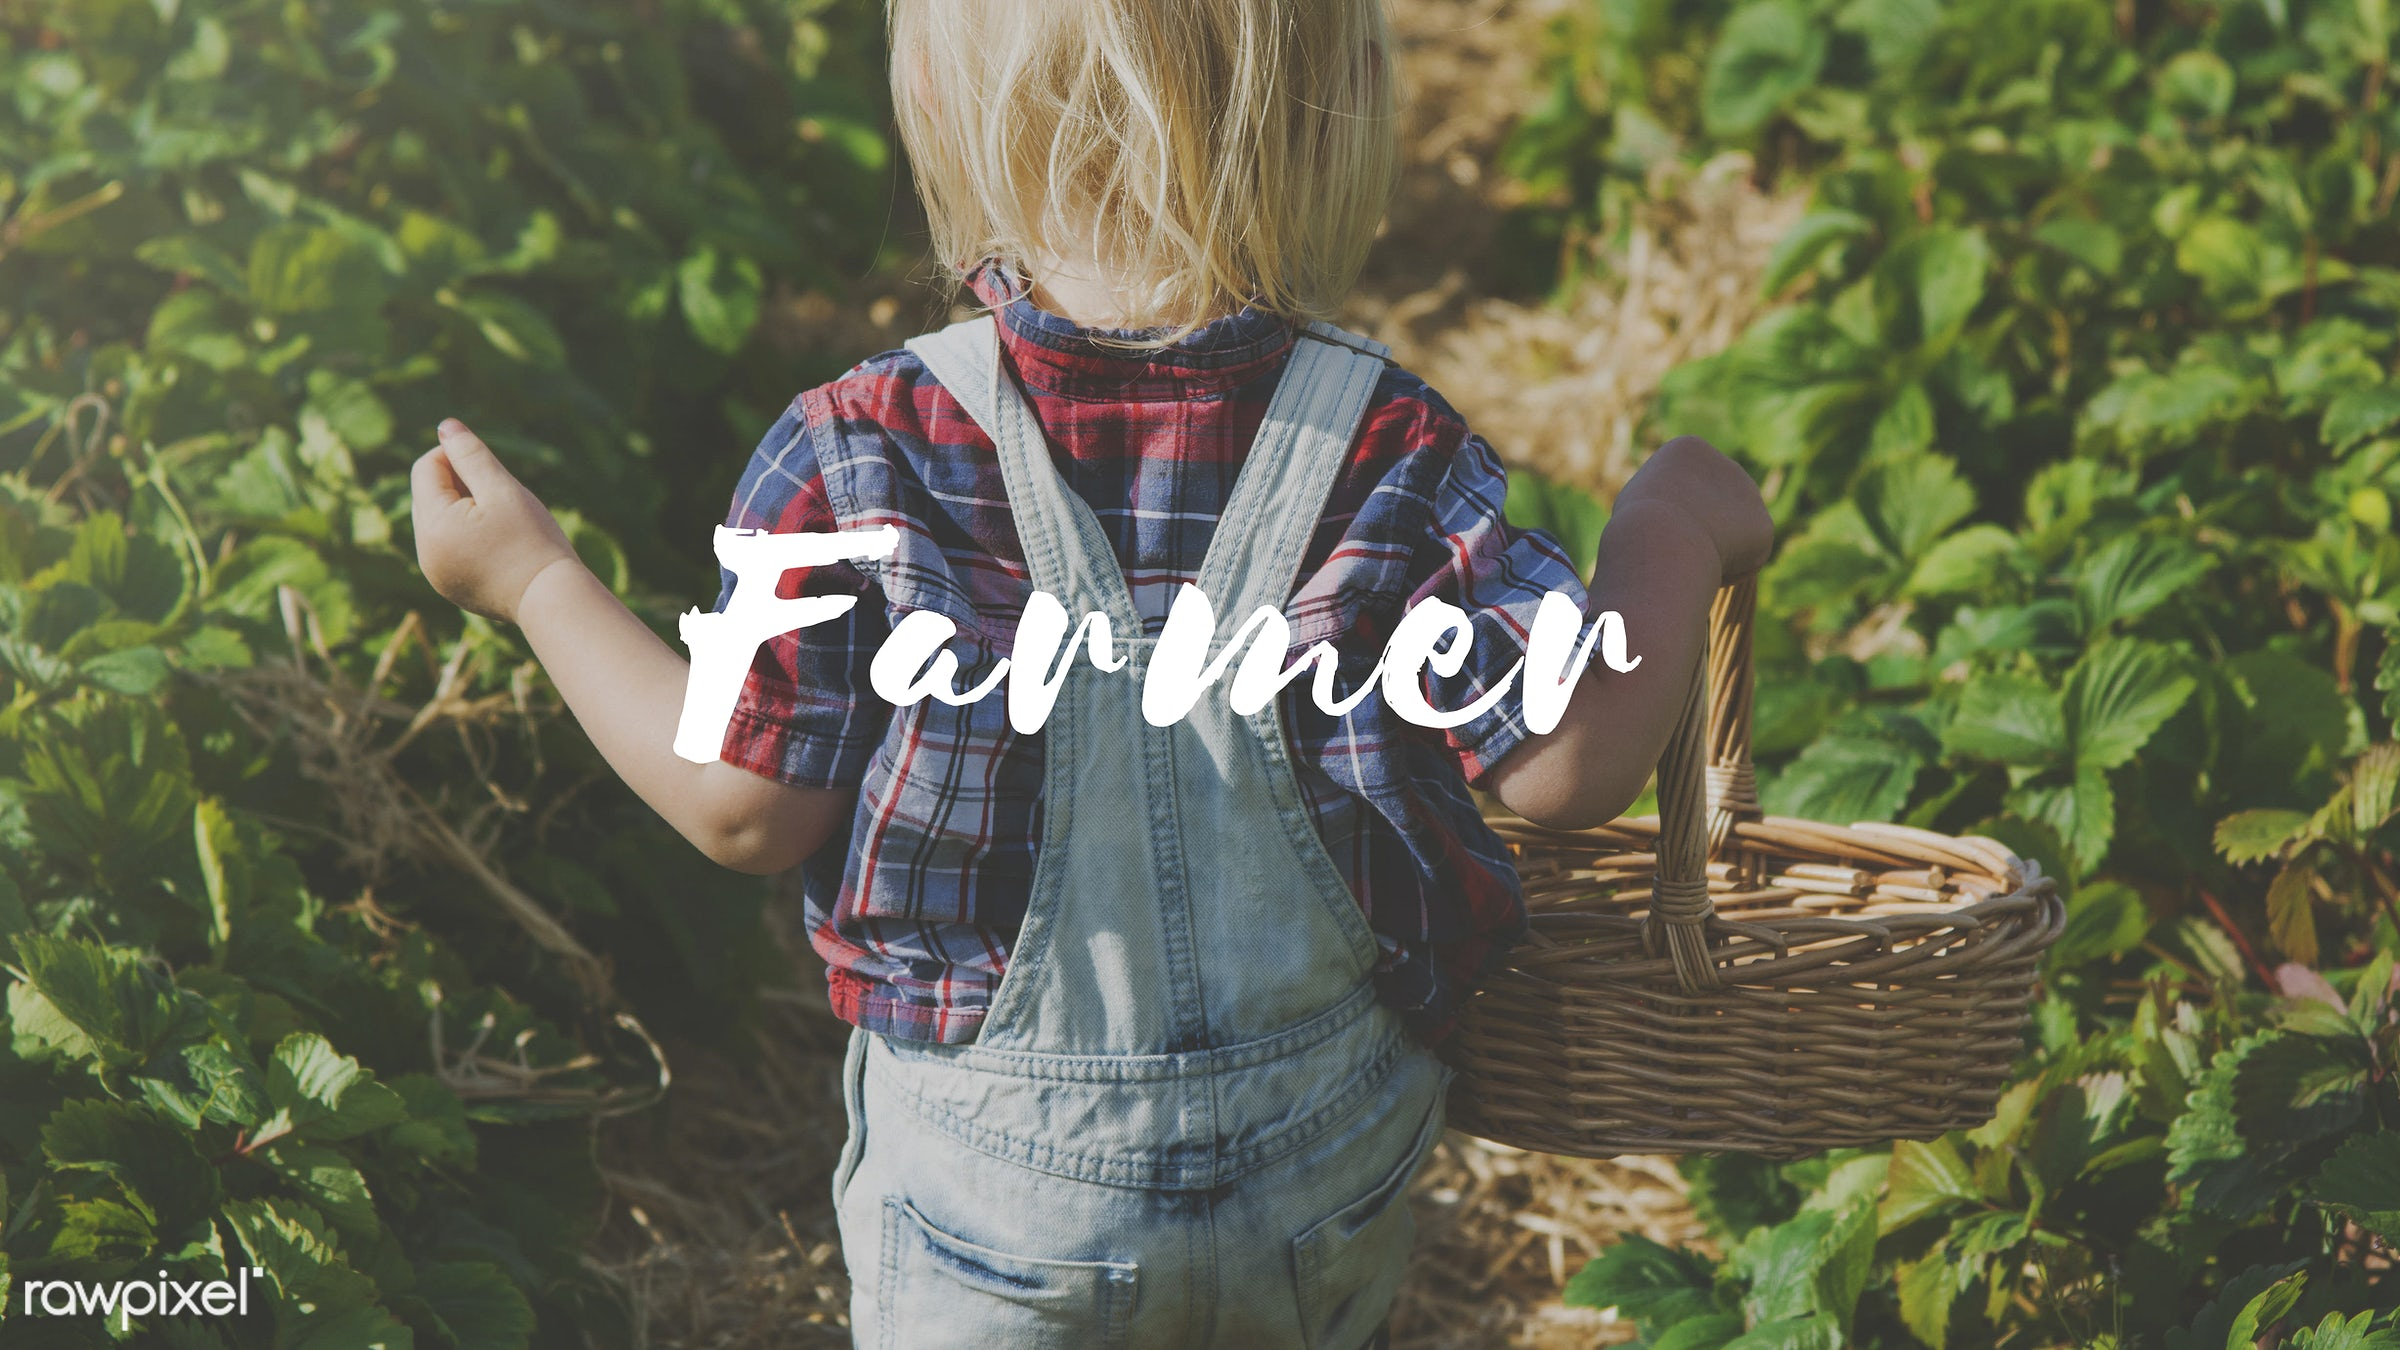 agriculture, basket, blonde, boy, caucasian, country, crops, cultivation, dungarees, farm, farmer, farming, food, fruit, fun...